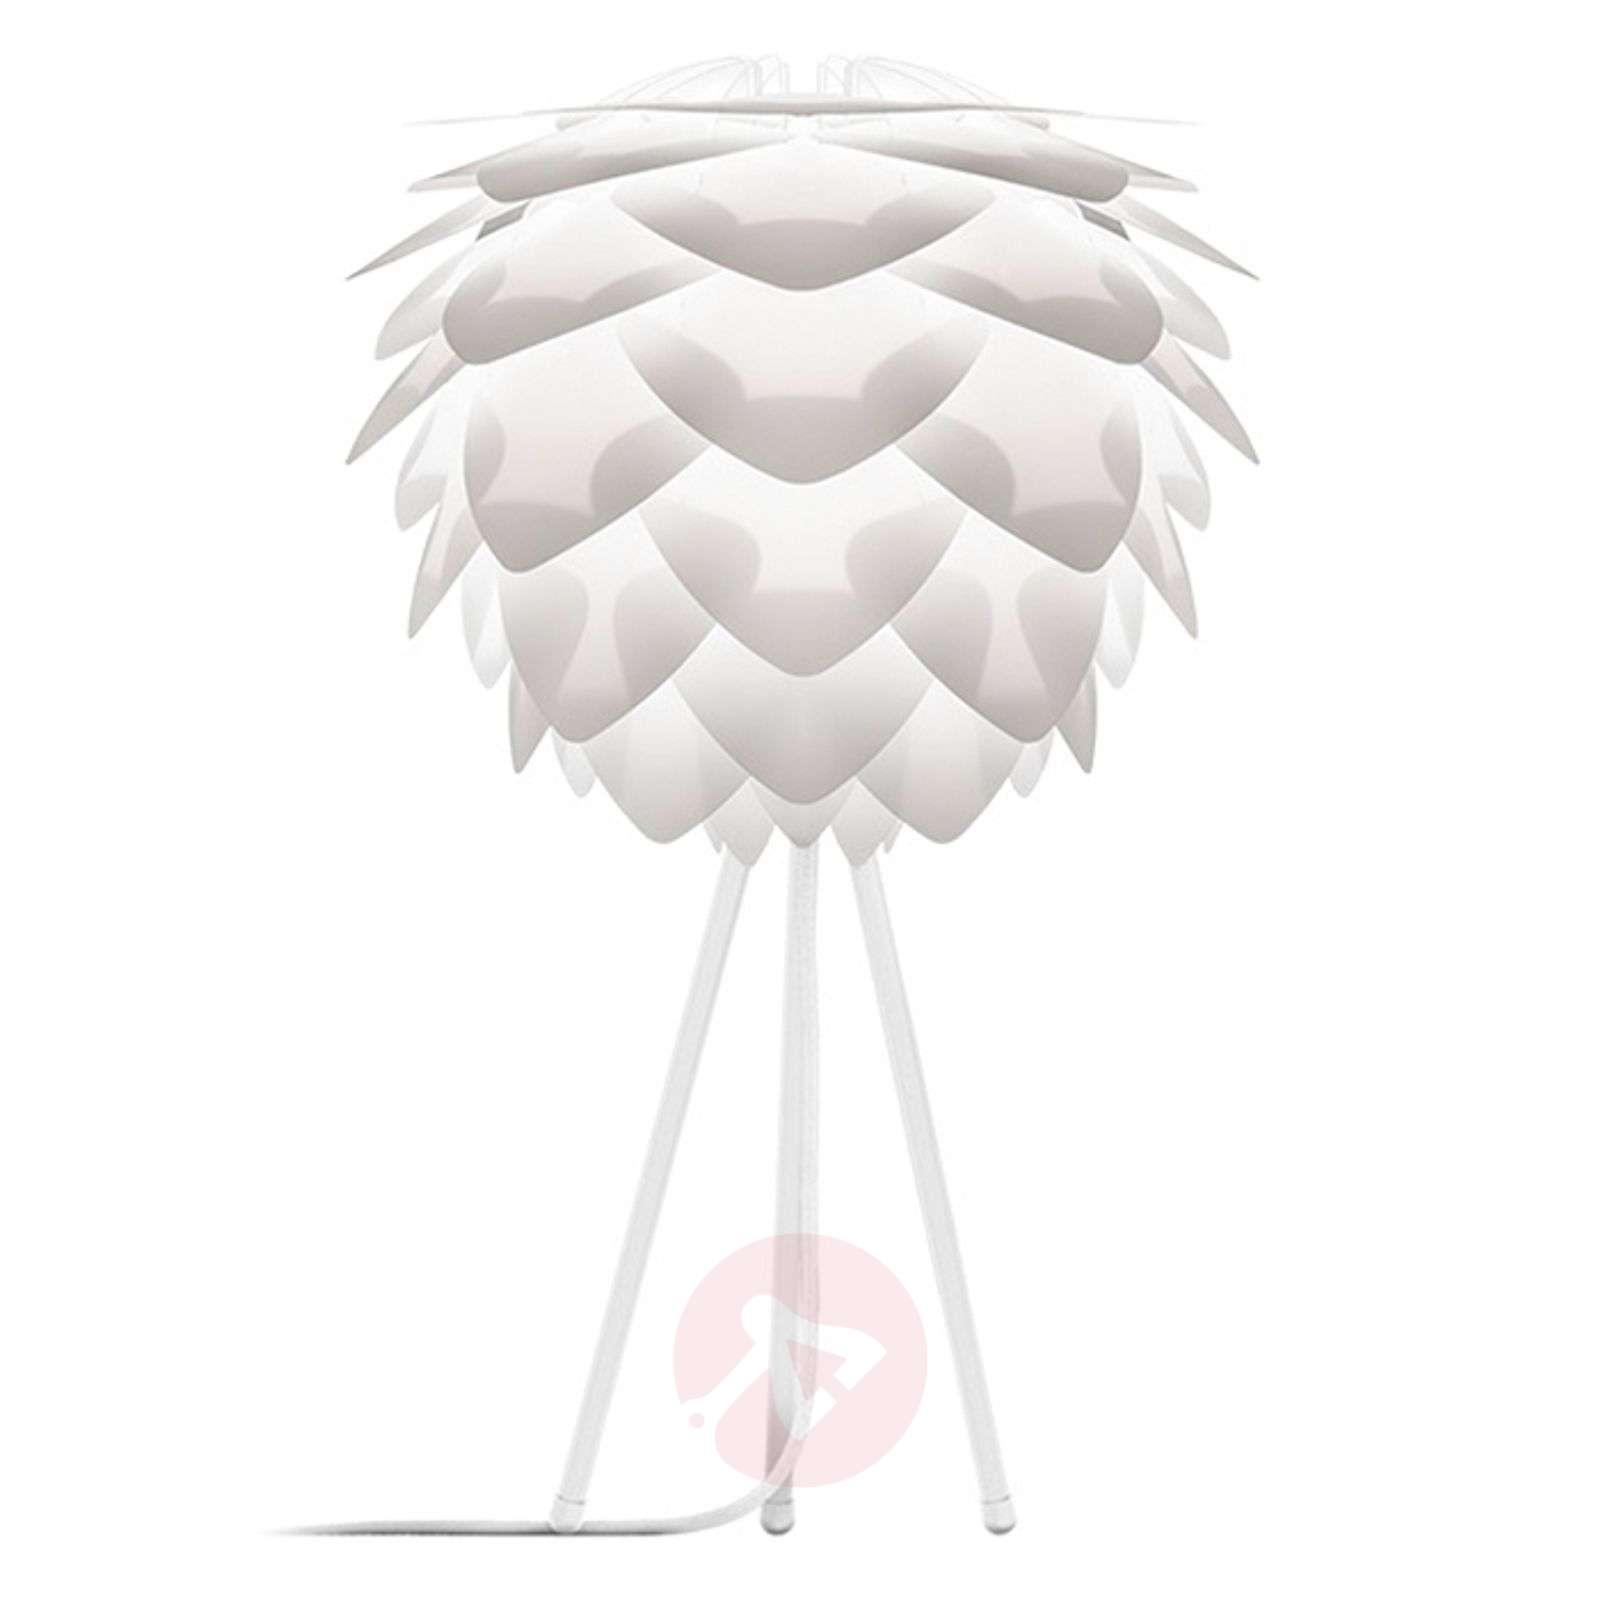 UMAGE Silvia mini floor lamp, white-9521137-01